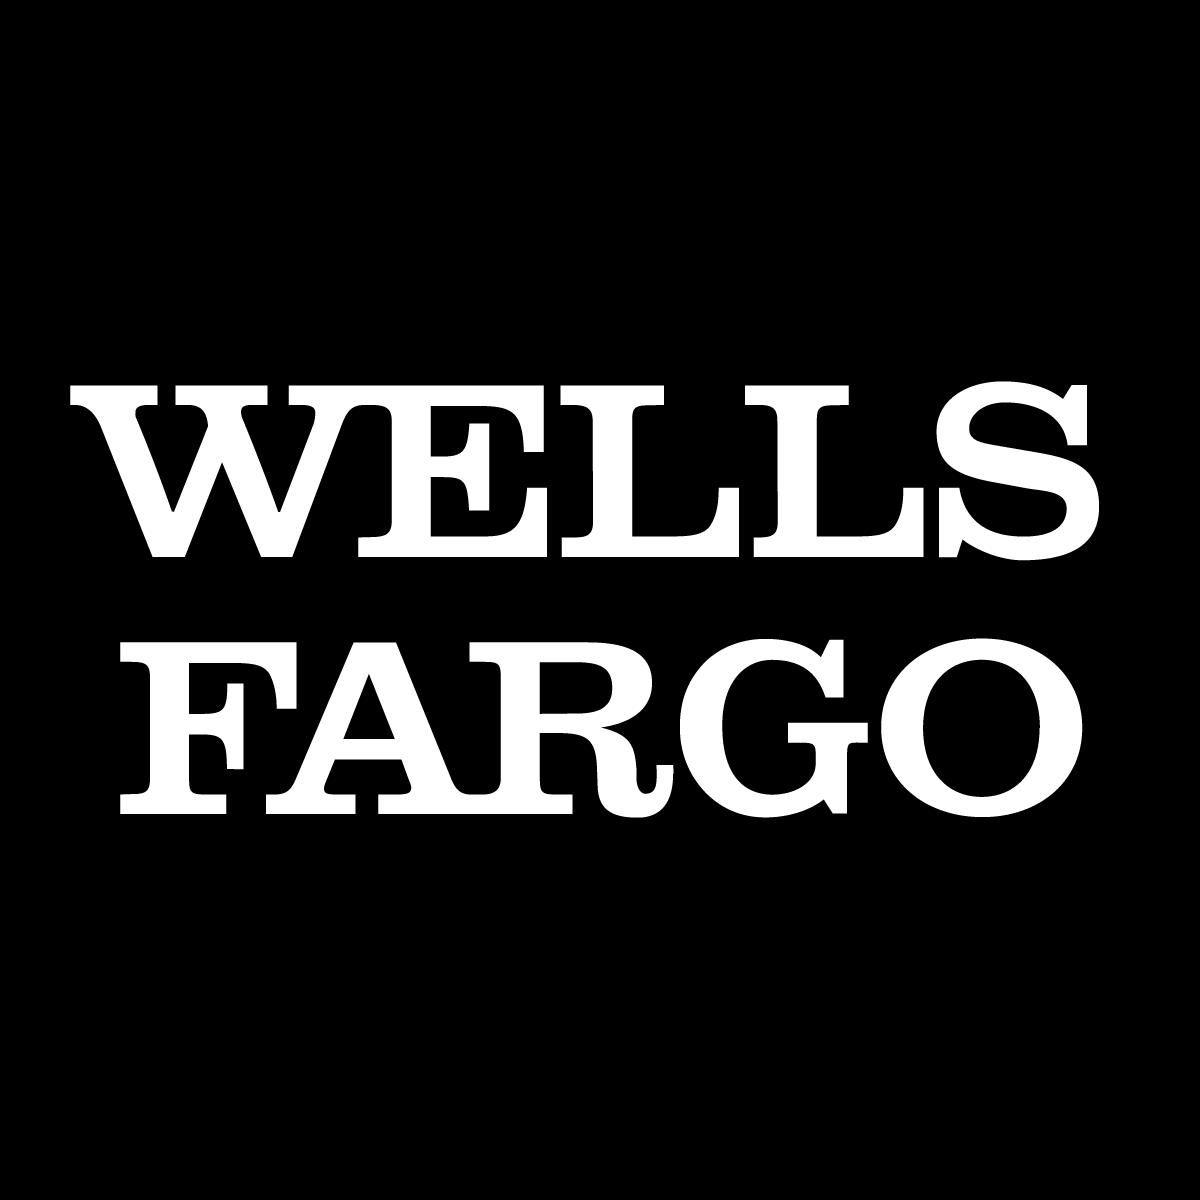 Clarendon Bold Wells Fargo Mortgage Wells Fargo Logo Wells Fargo